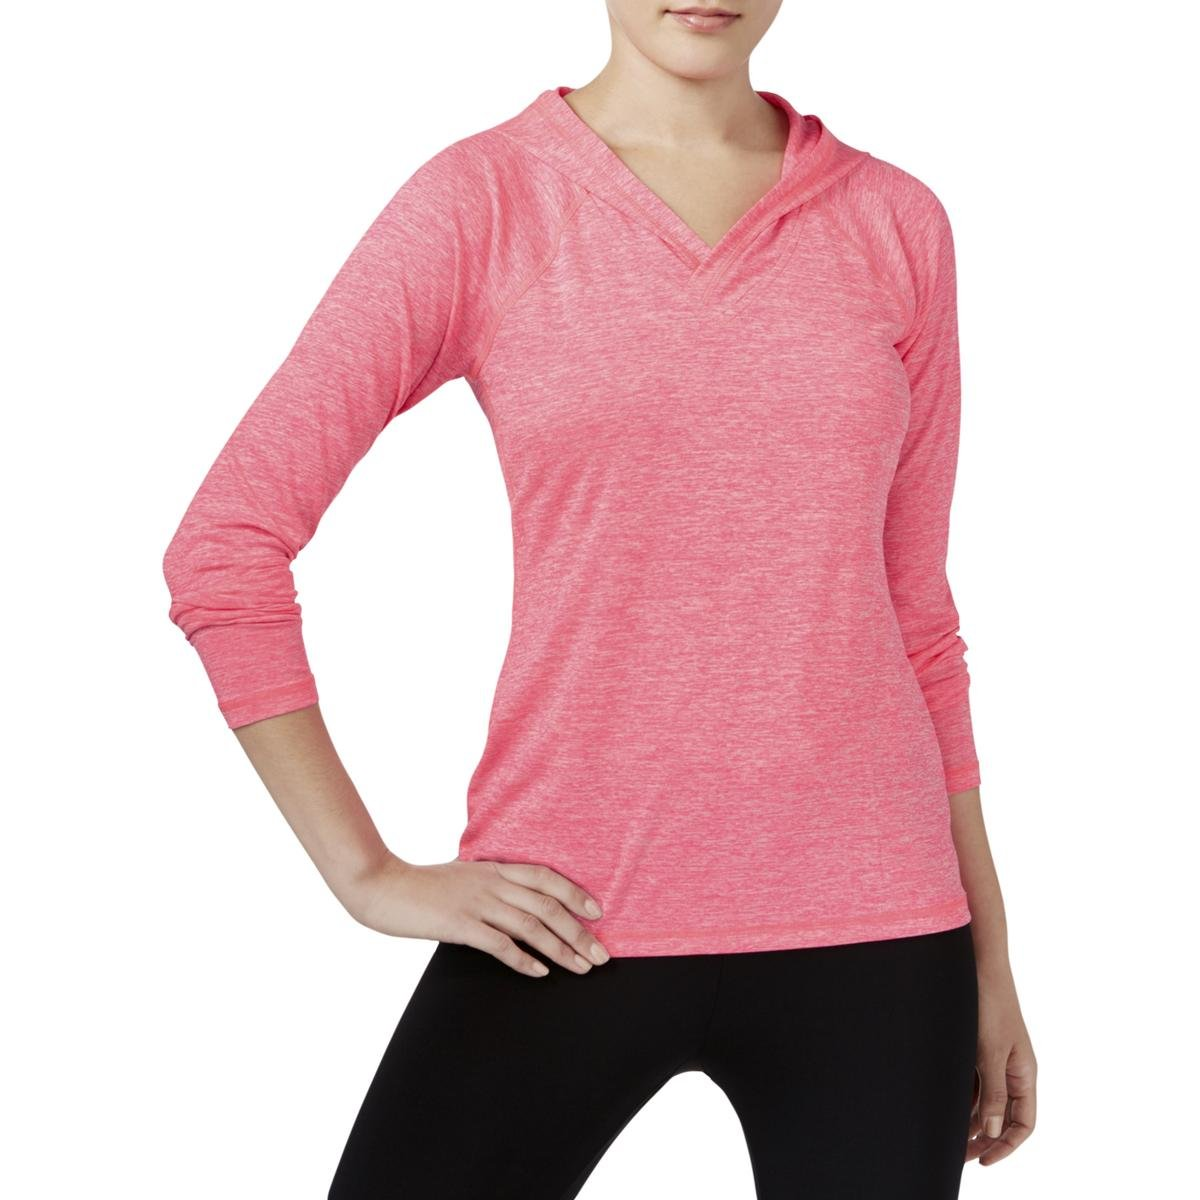 Ideology Womens Moisture Wicking Hooded Shirts & Tops Pink M